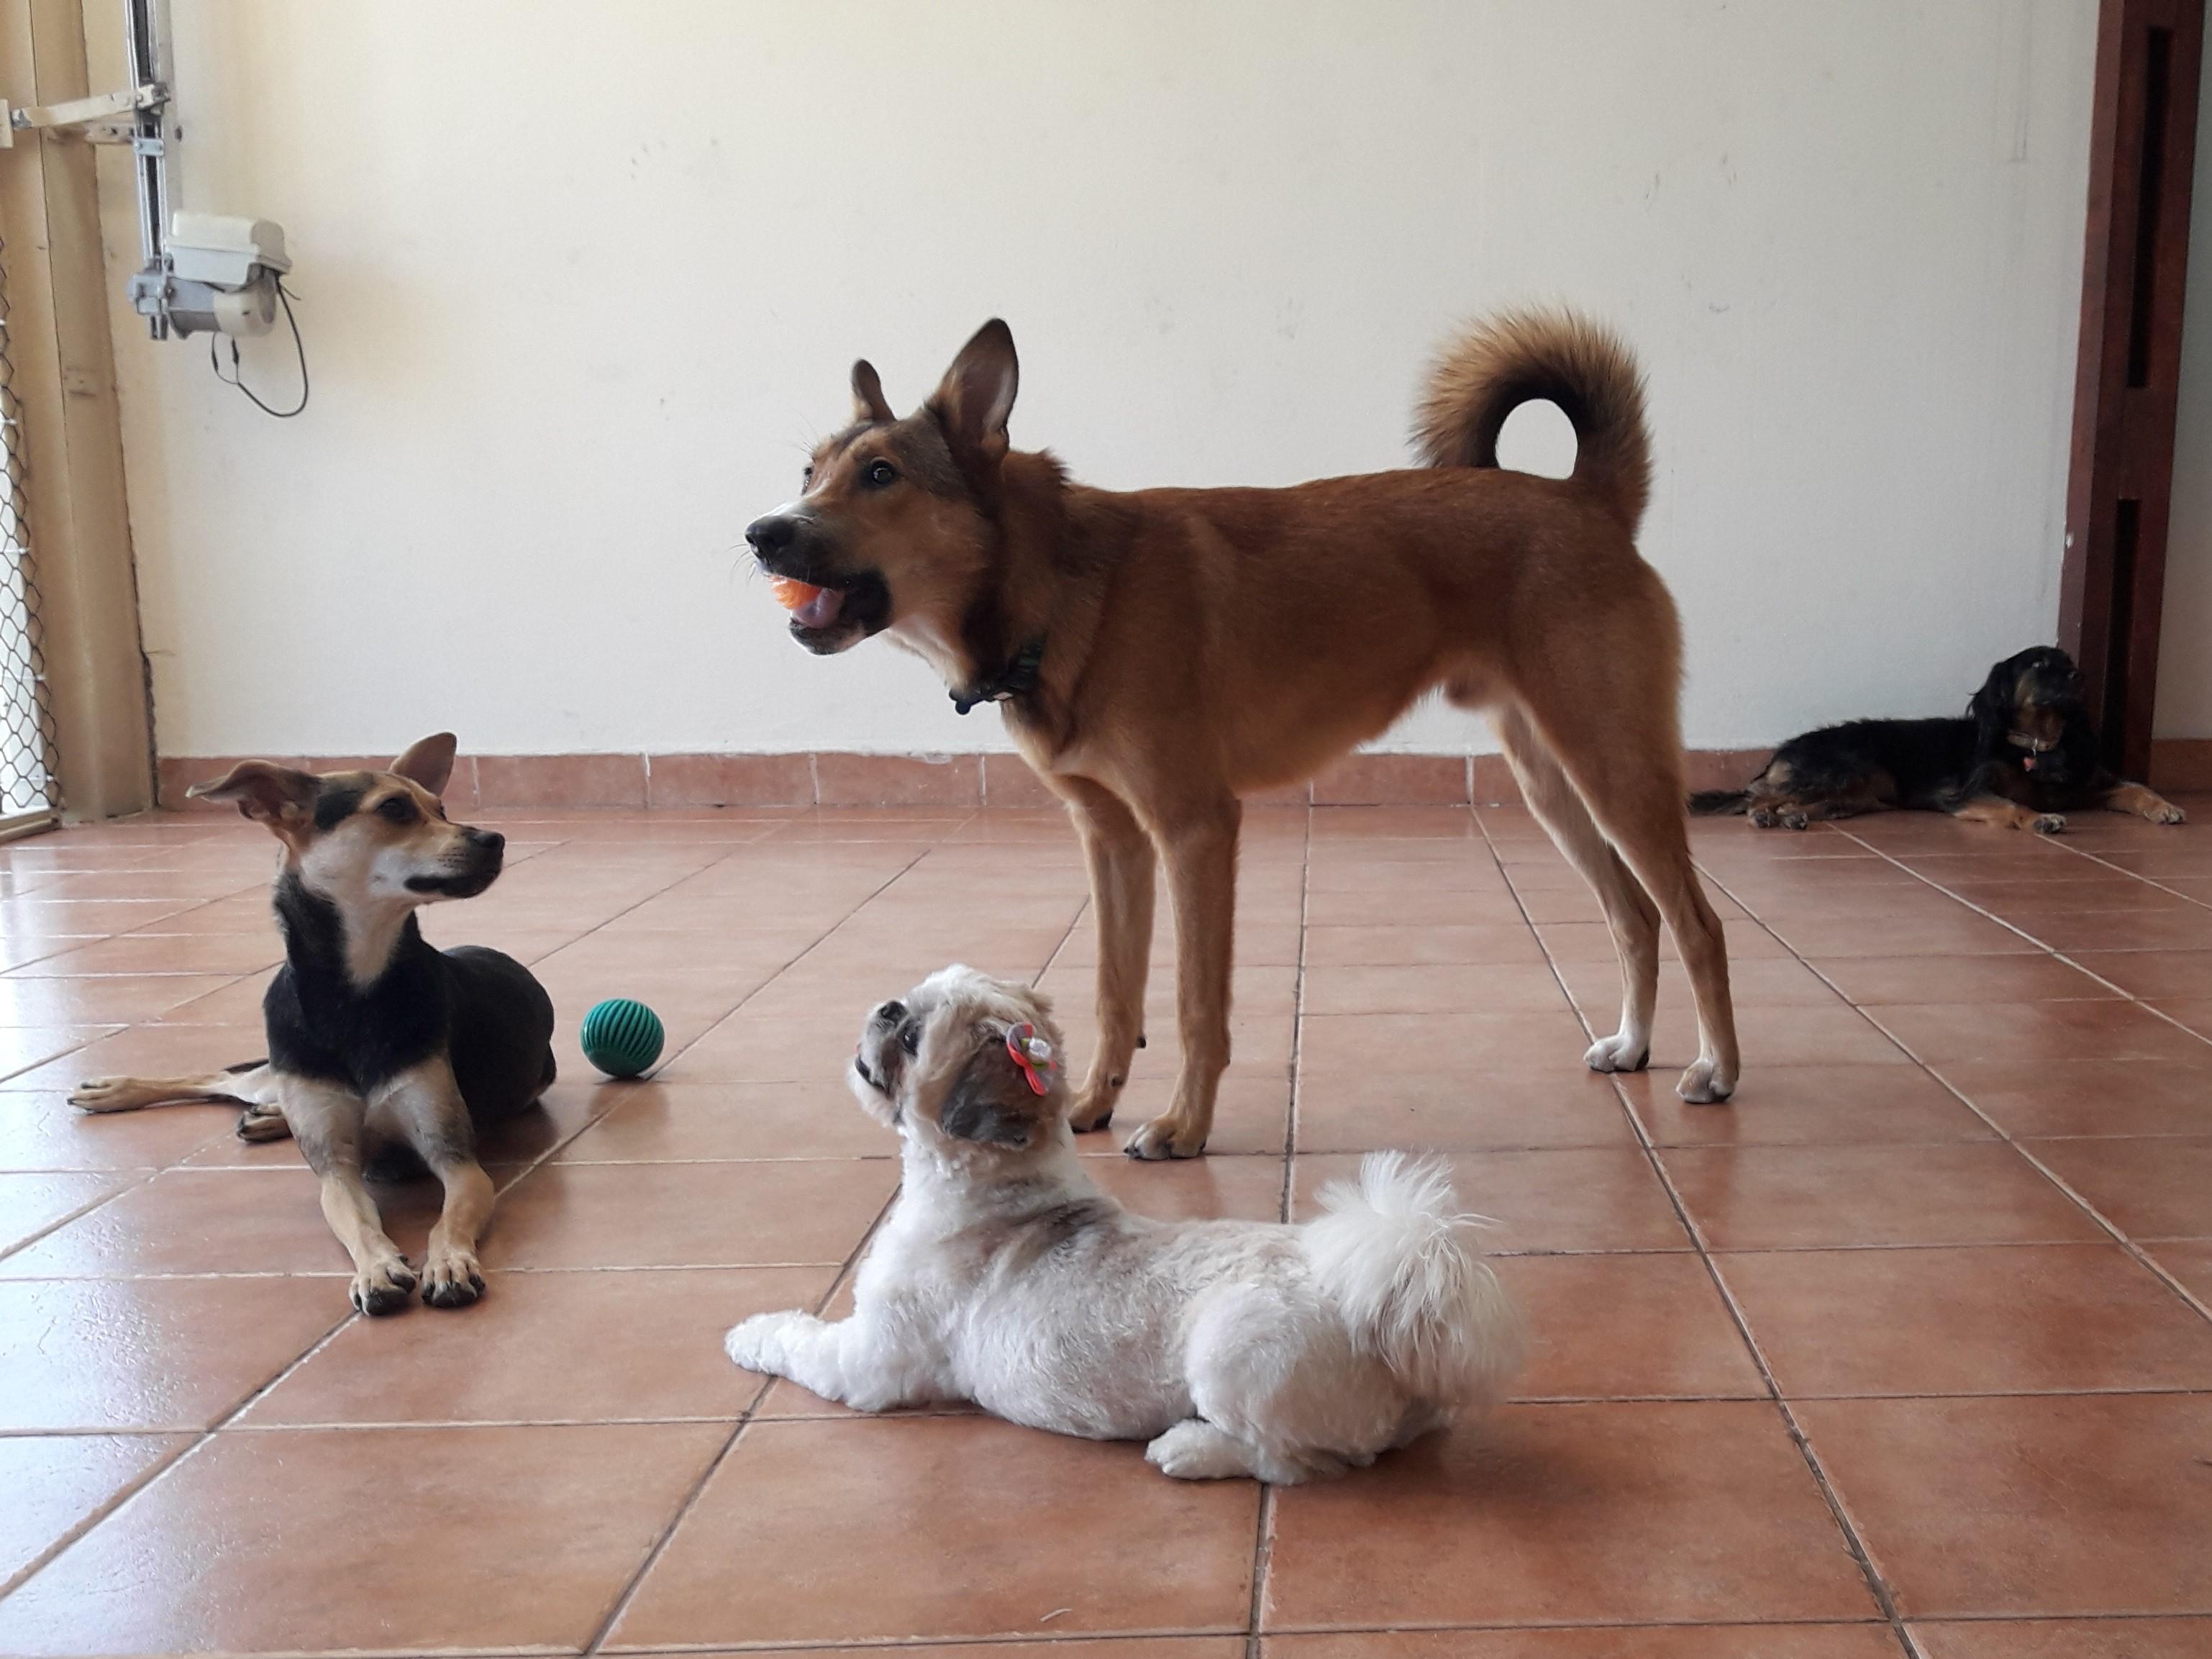 Dogs-bolinha-bangalo